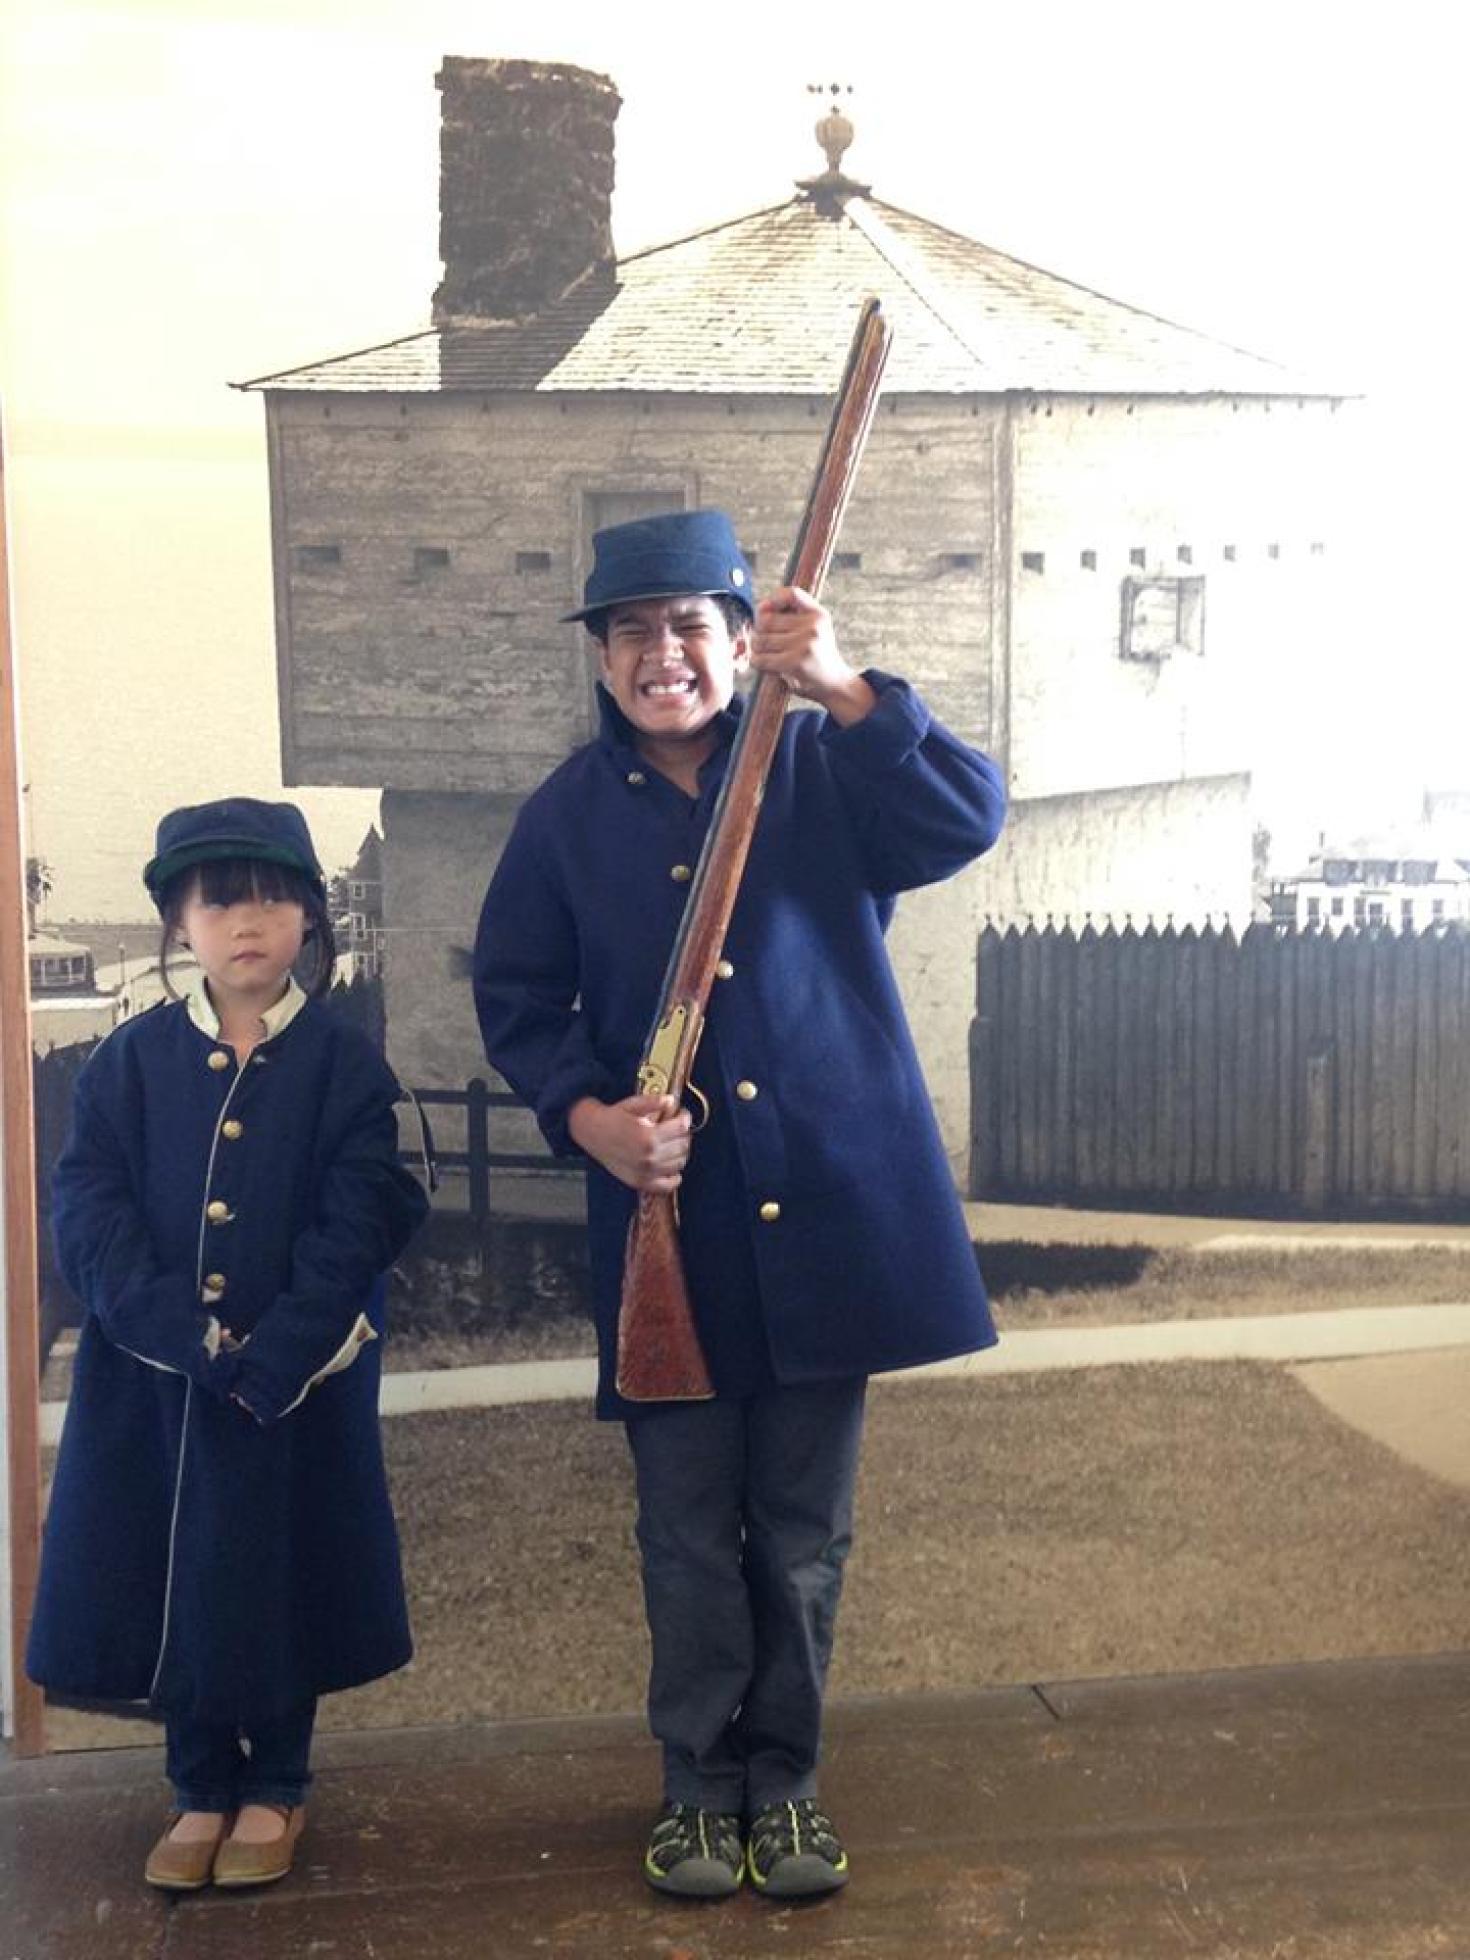 kids-in-uniforms